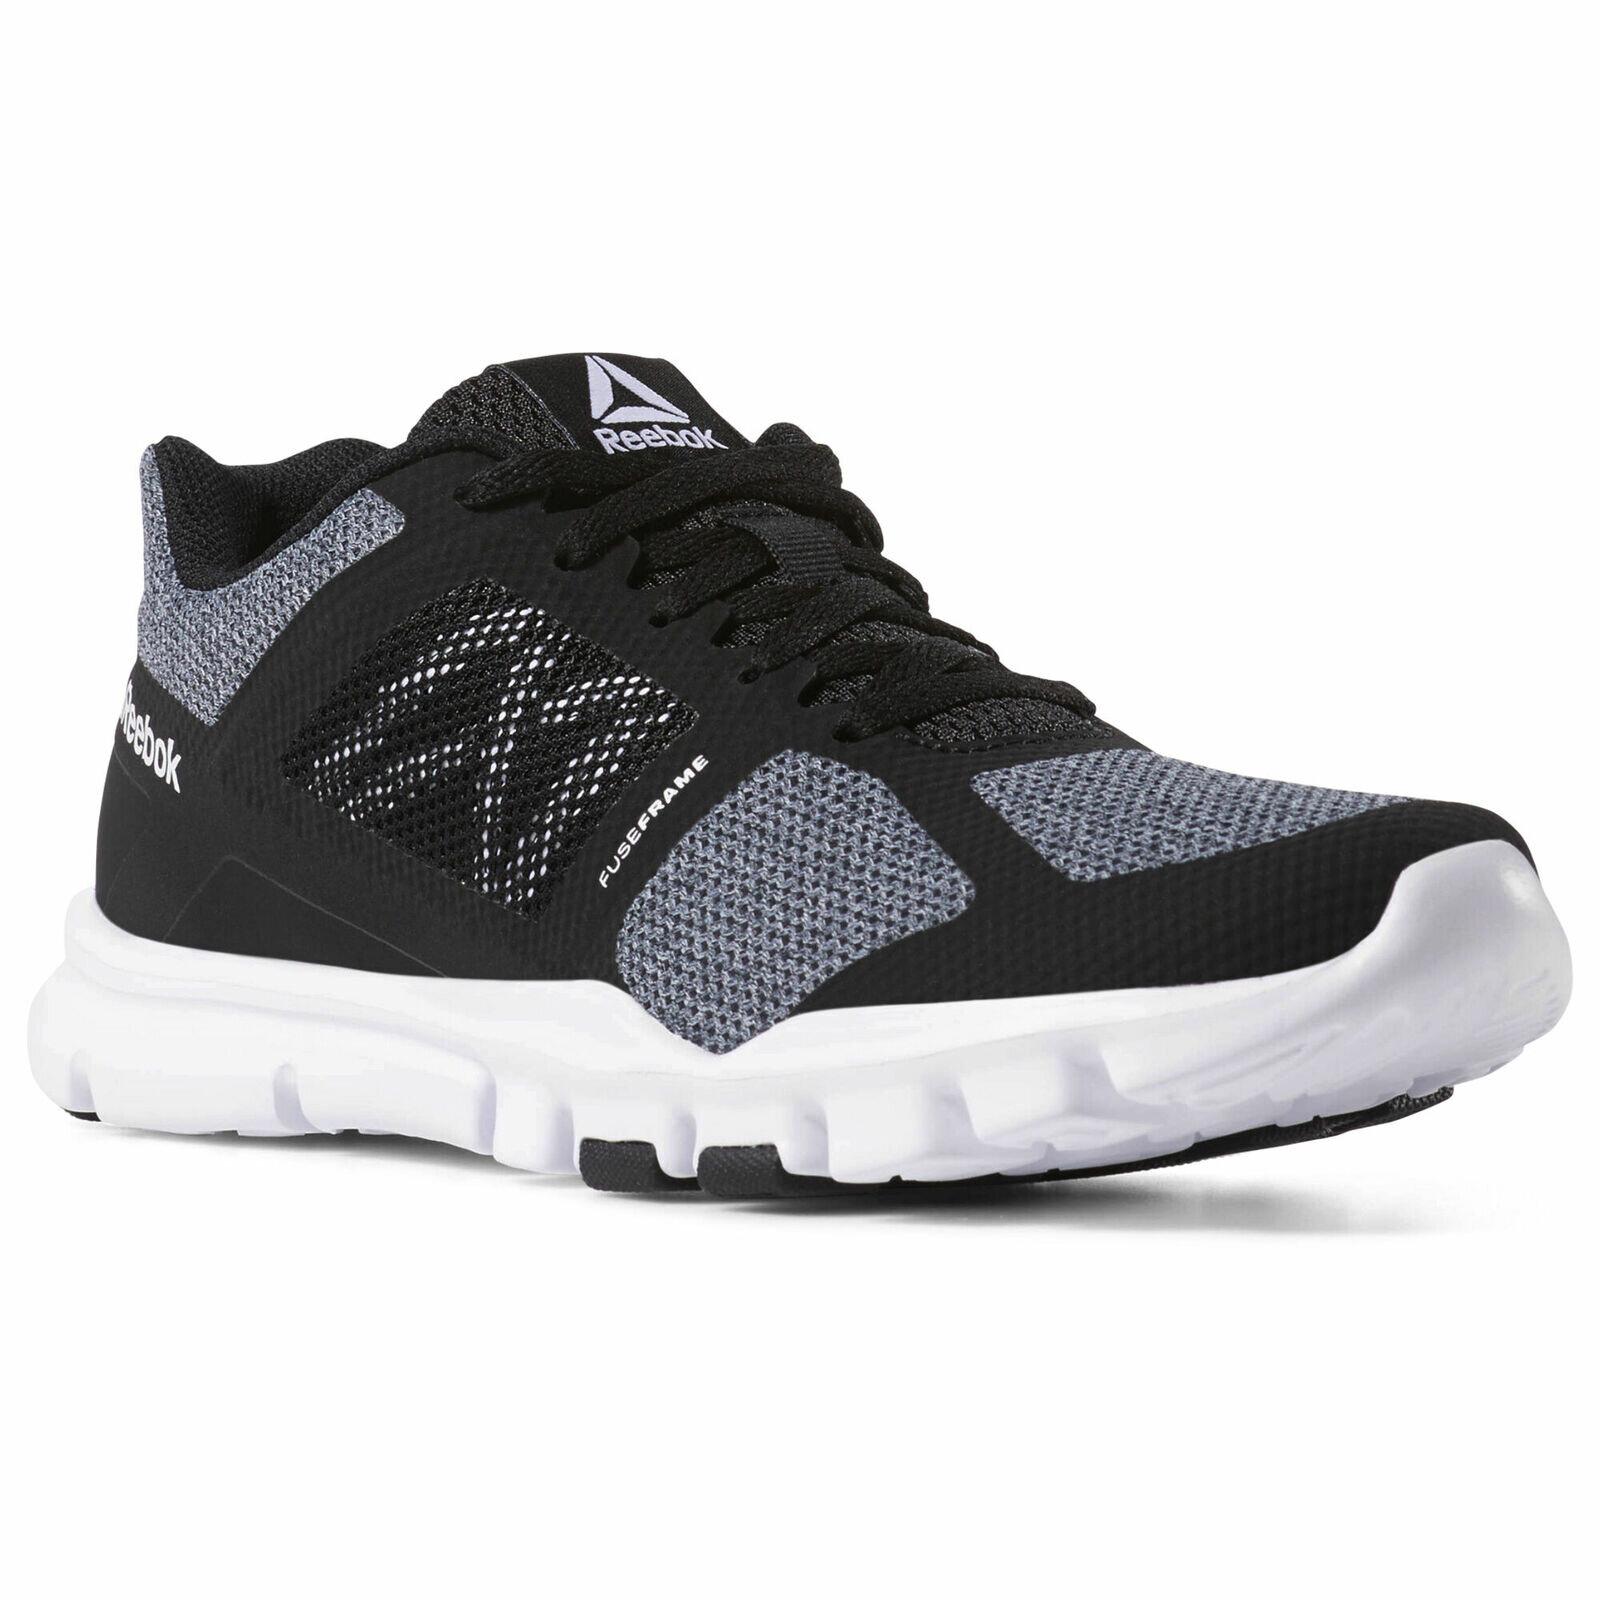 Reebok Women's Yourflex Trainette Shoes   Reg Price: $60   Today's Price: $25 (58% off!)    via eBay